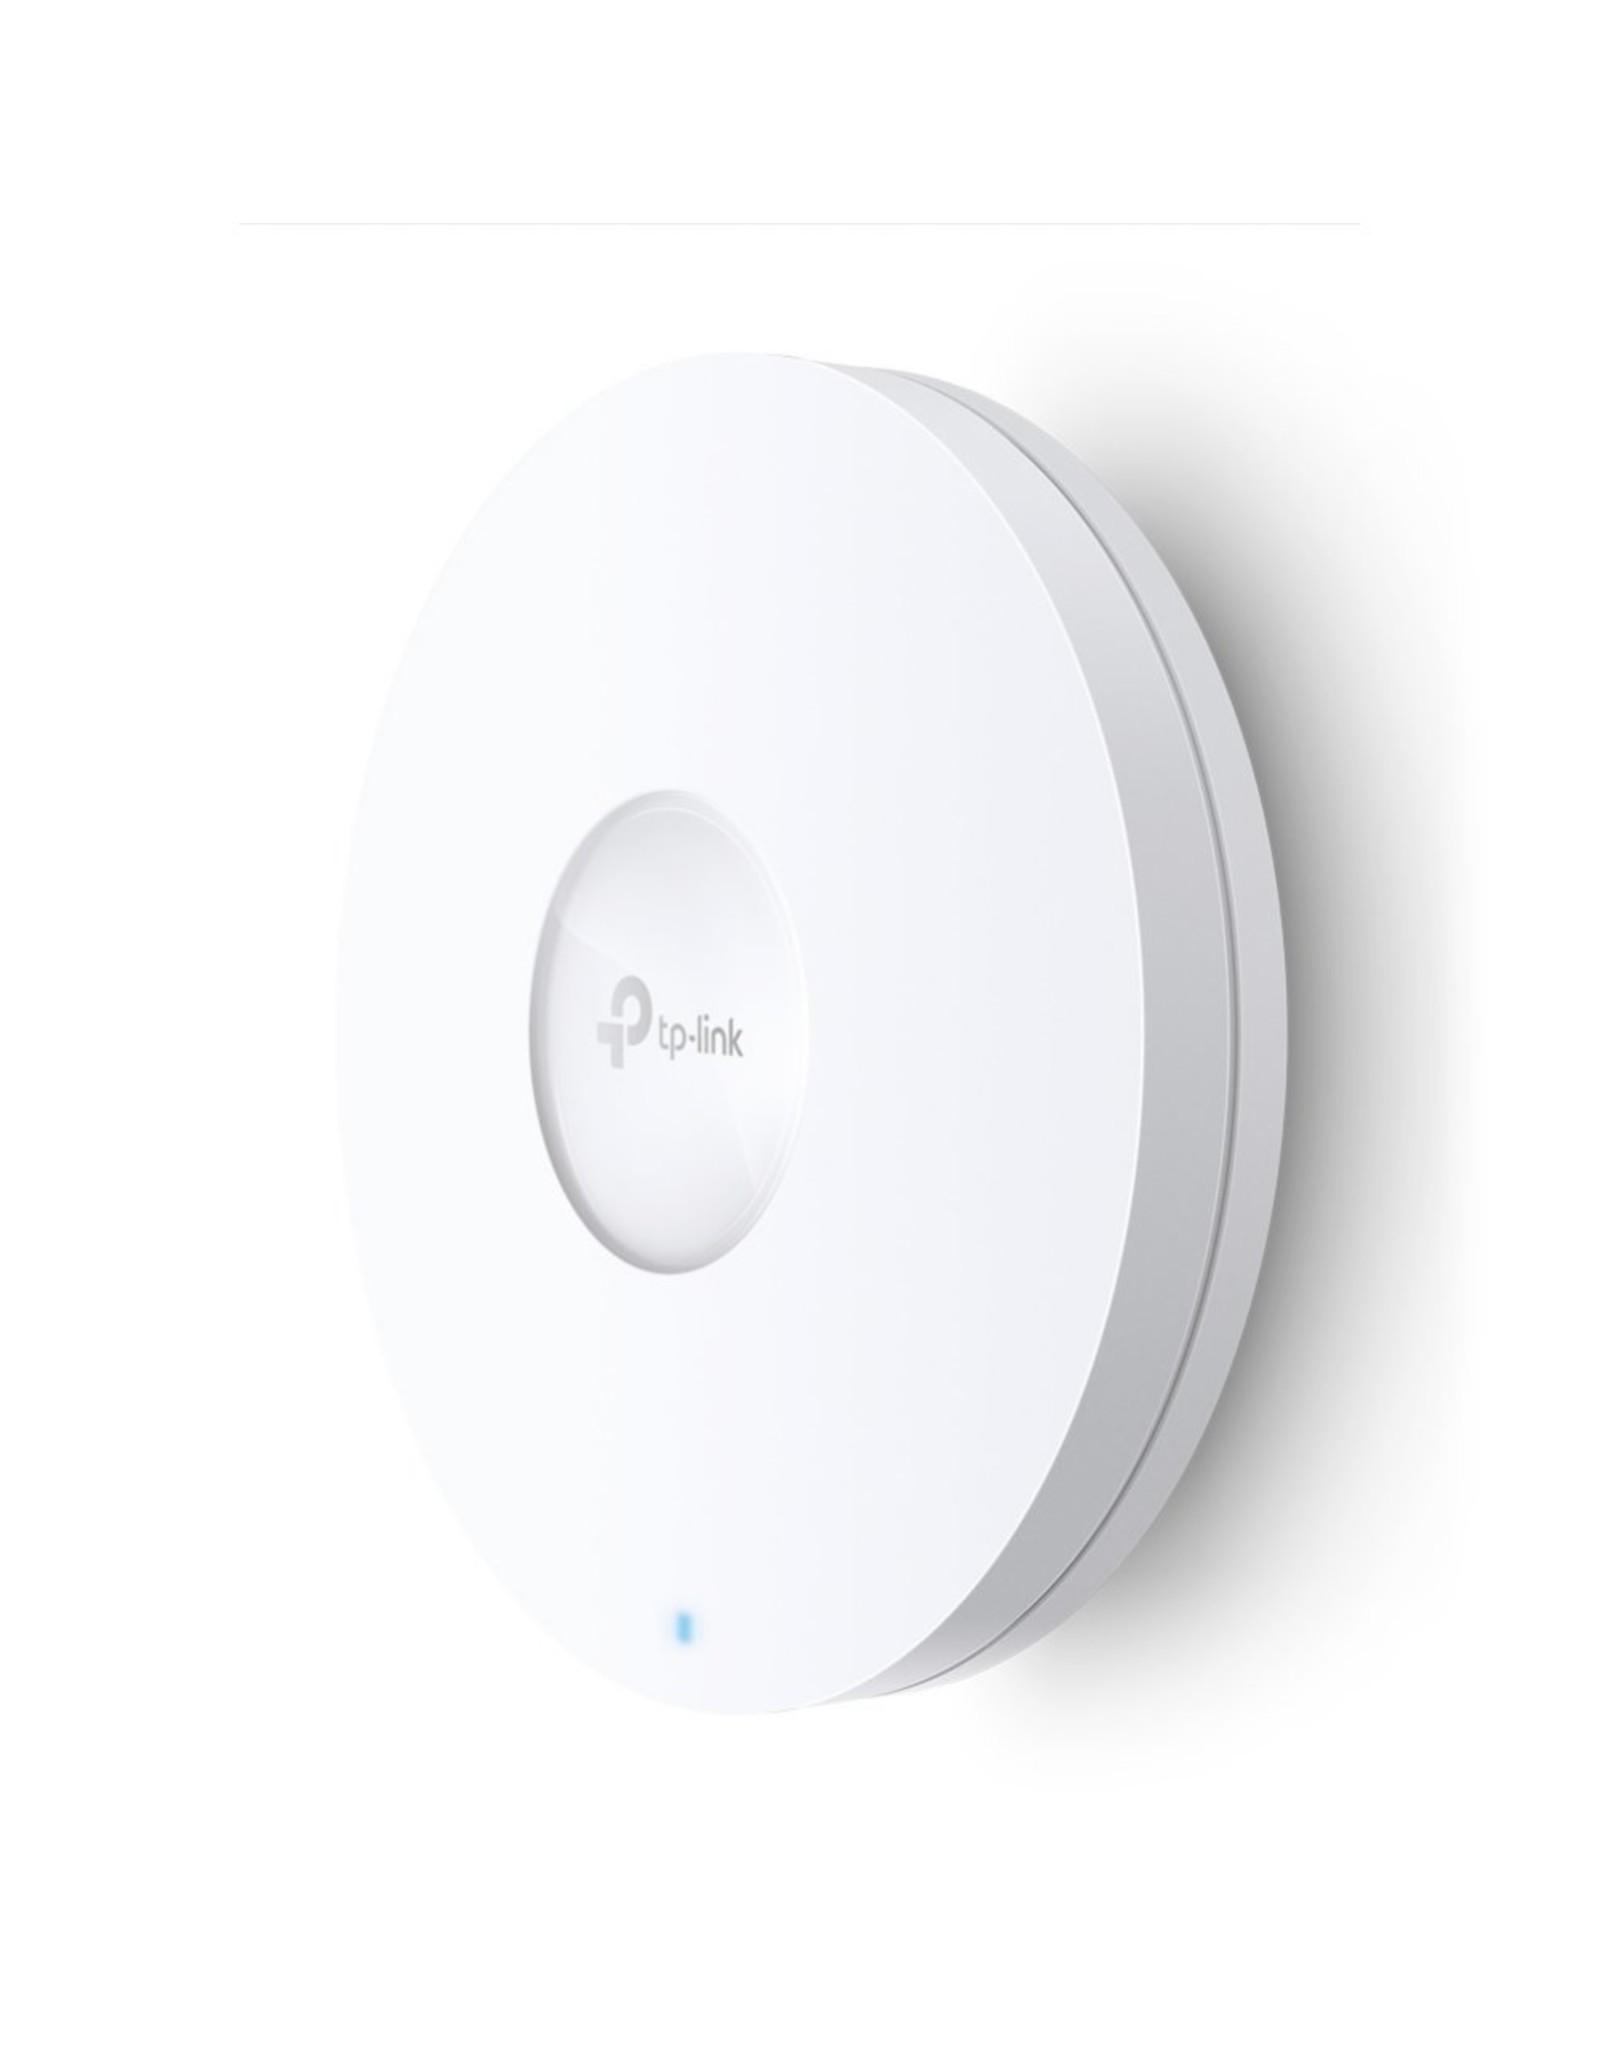 TP-Link TP-LINK EAP660 HD draadloos toegangspunt (WAP) 2500 Mbit/s W